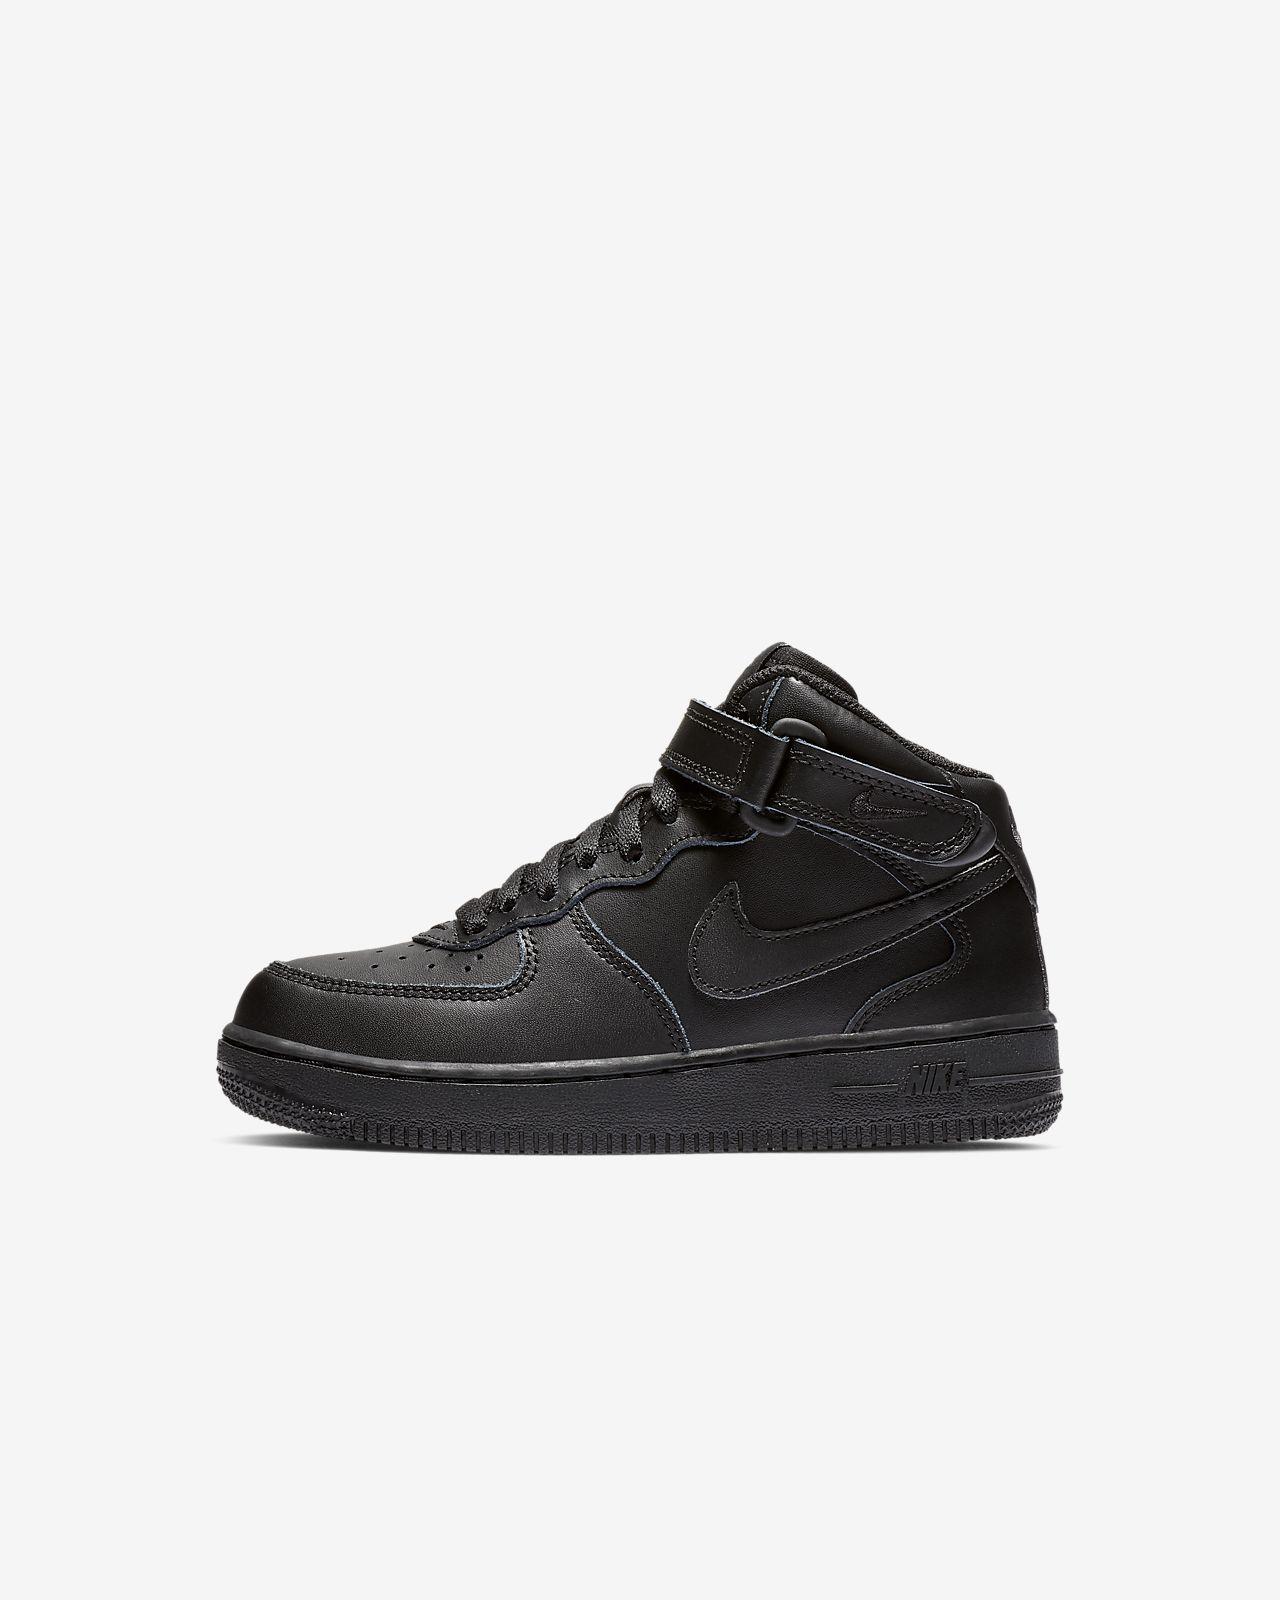 zapatillas nike niño velcro, Nike Nike Air Force One m Negro